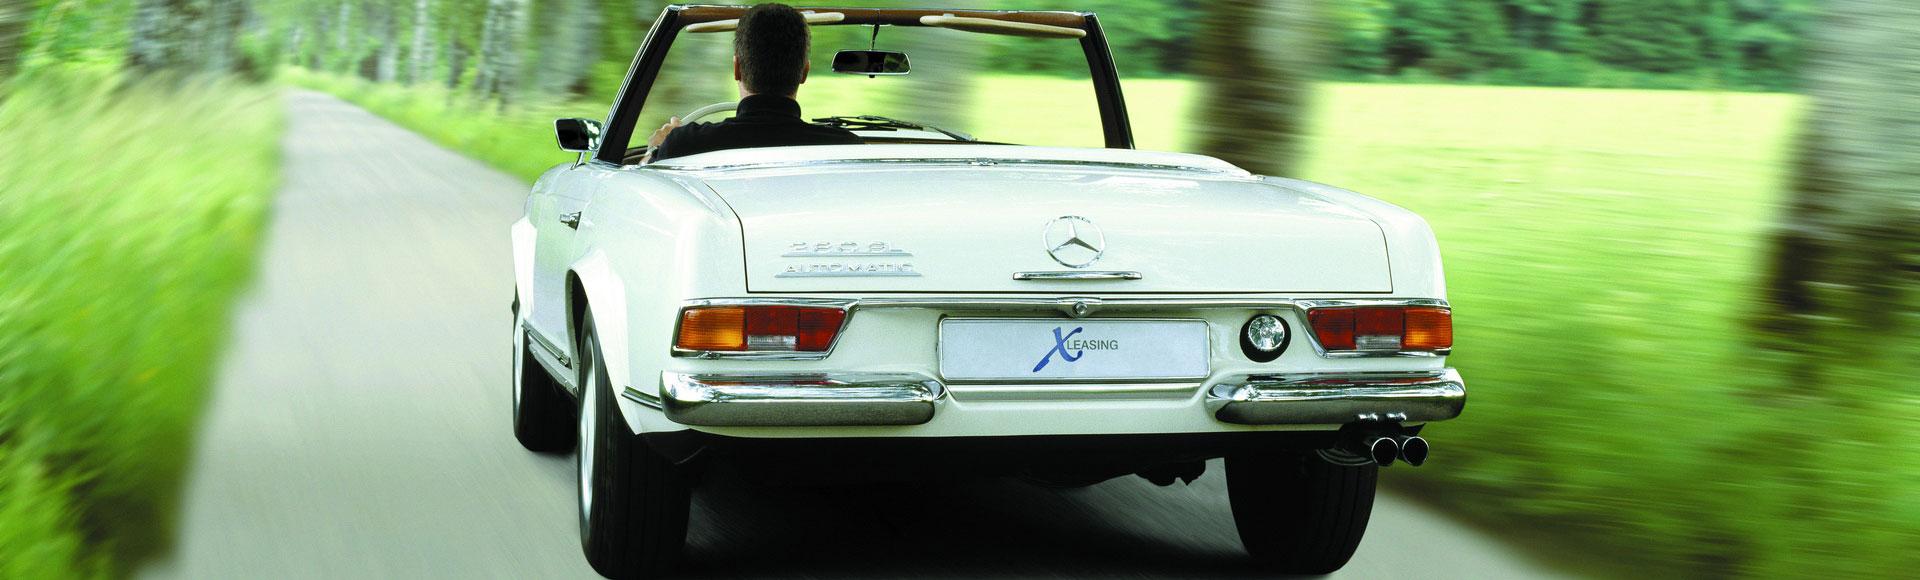 Mercedes Benz Pagode X Edition